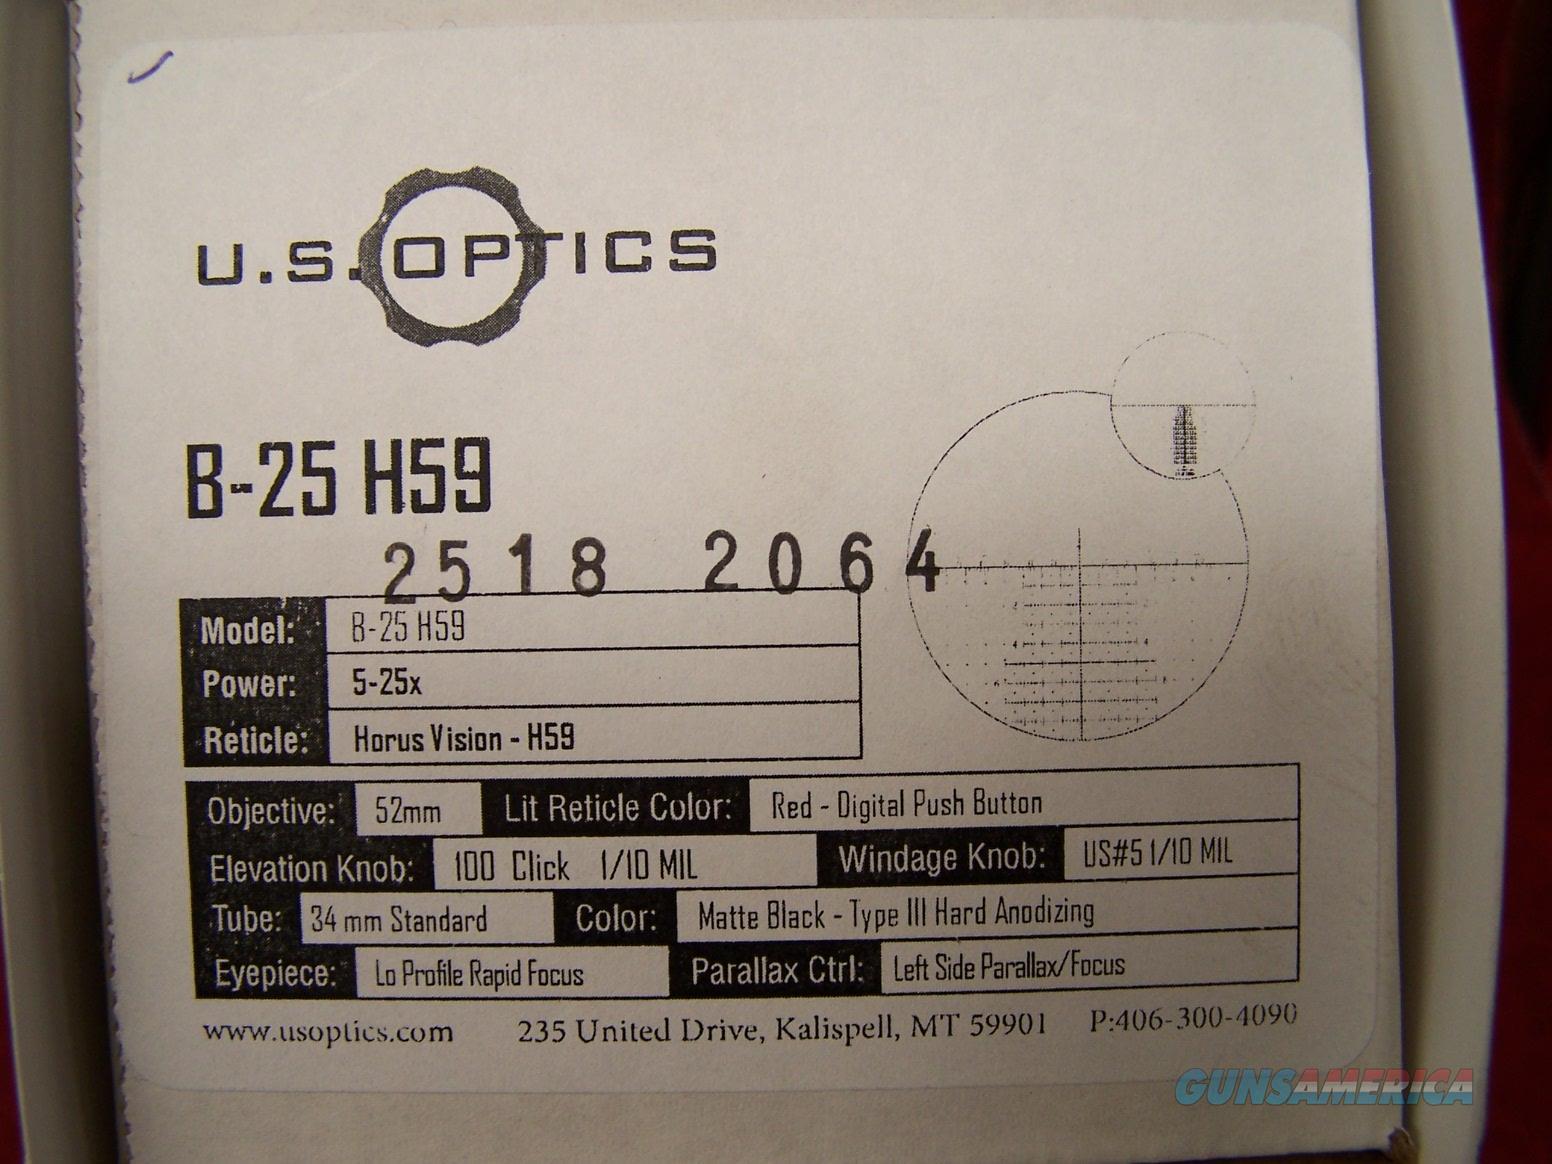 U.S. Optics B-25 H59 5-25x 52mm Red Horus Vision Lit Reticle  Non-Guns > Scopes/Mounts/Rings & Optics > Rifle Scopes > Variable Focal Length